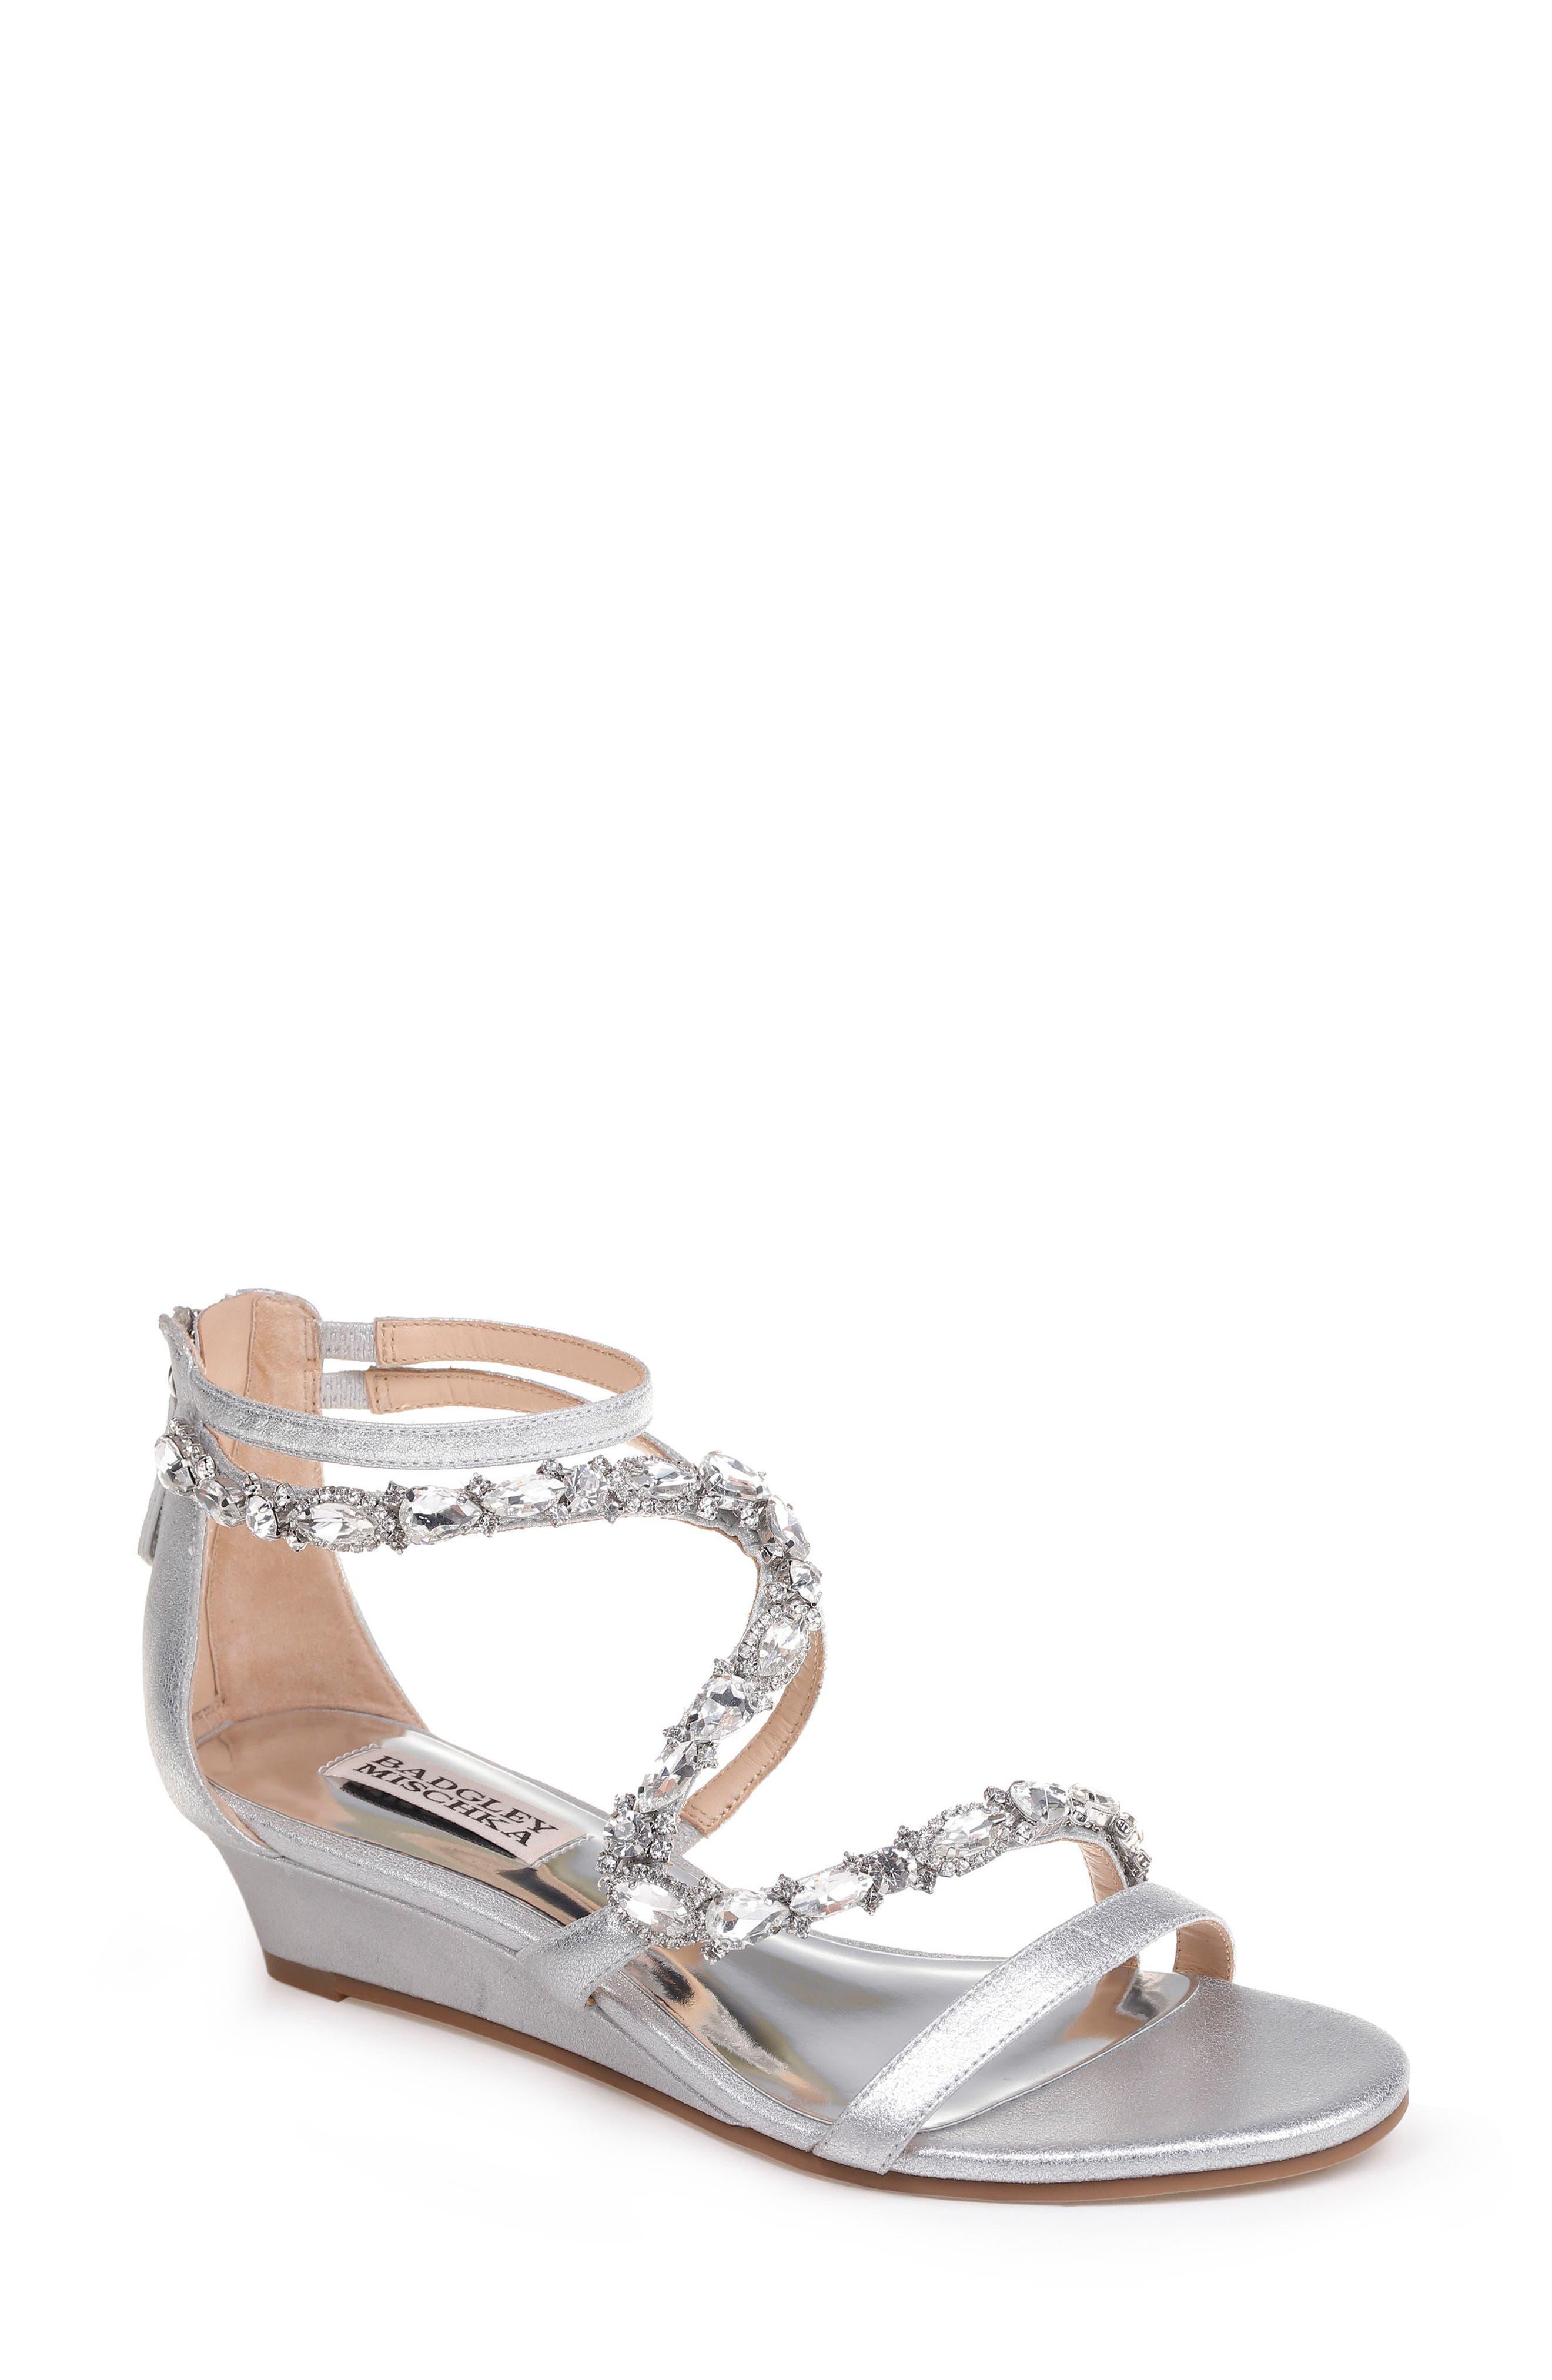 Alternate Image 1 Selected - Badgley Mischka Sierra Strappy Wedge Sandal (Women)